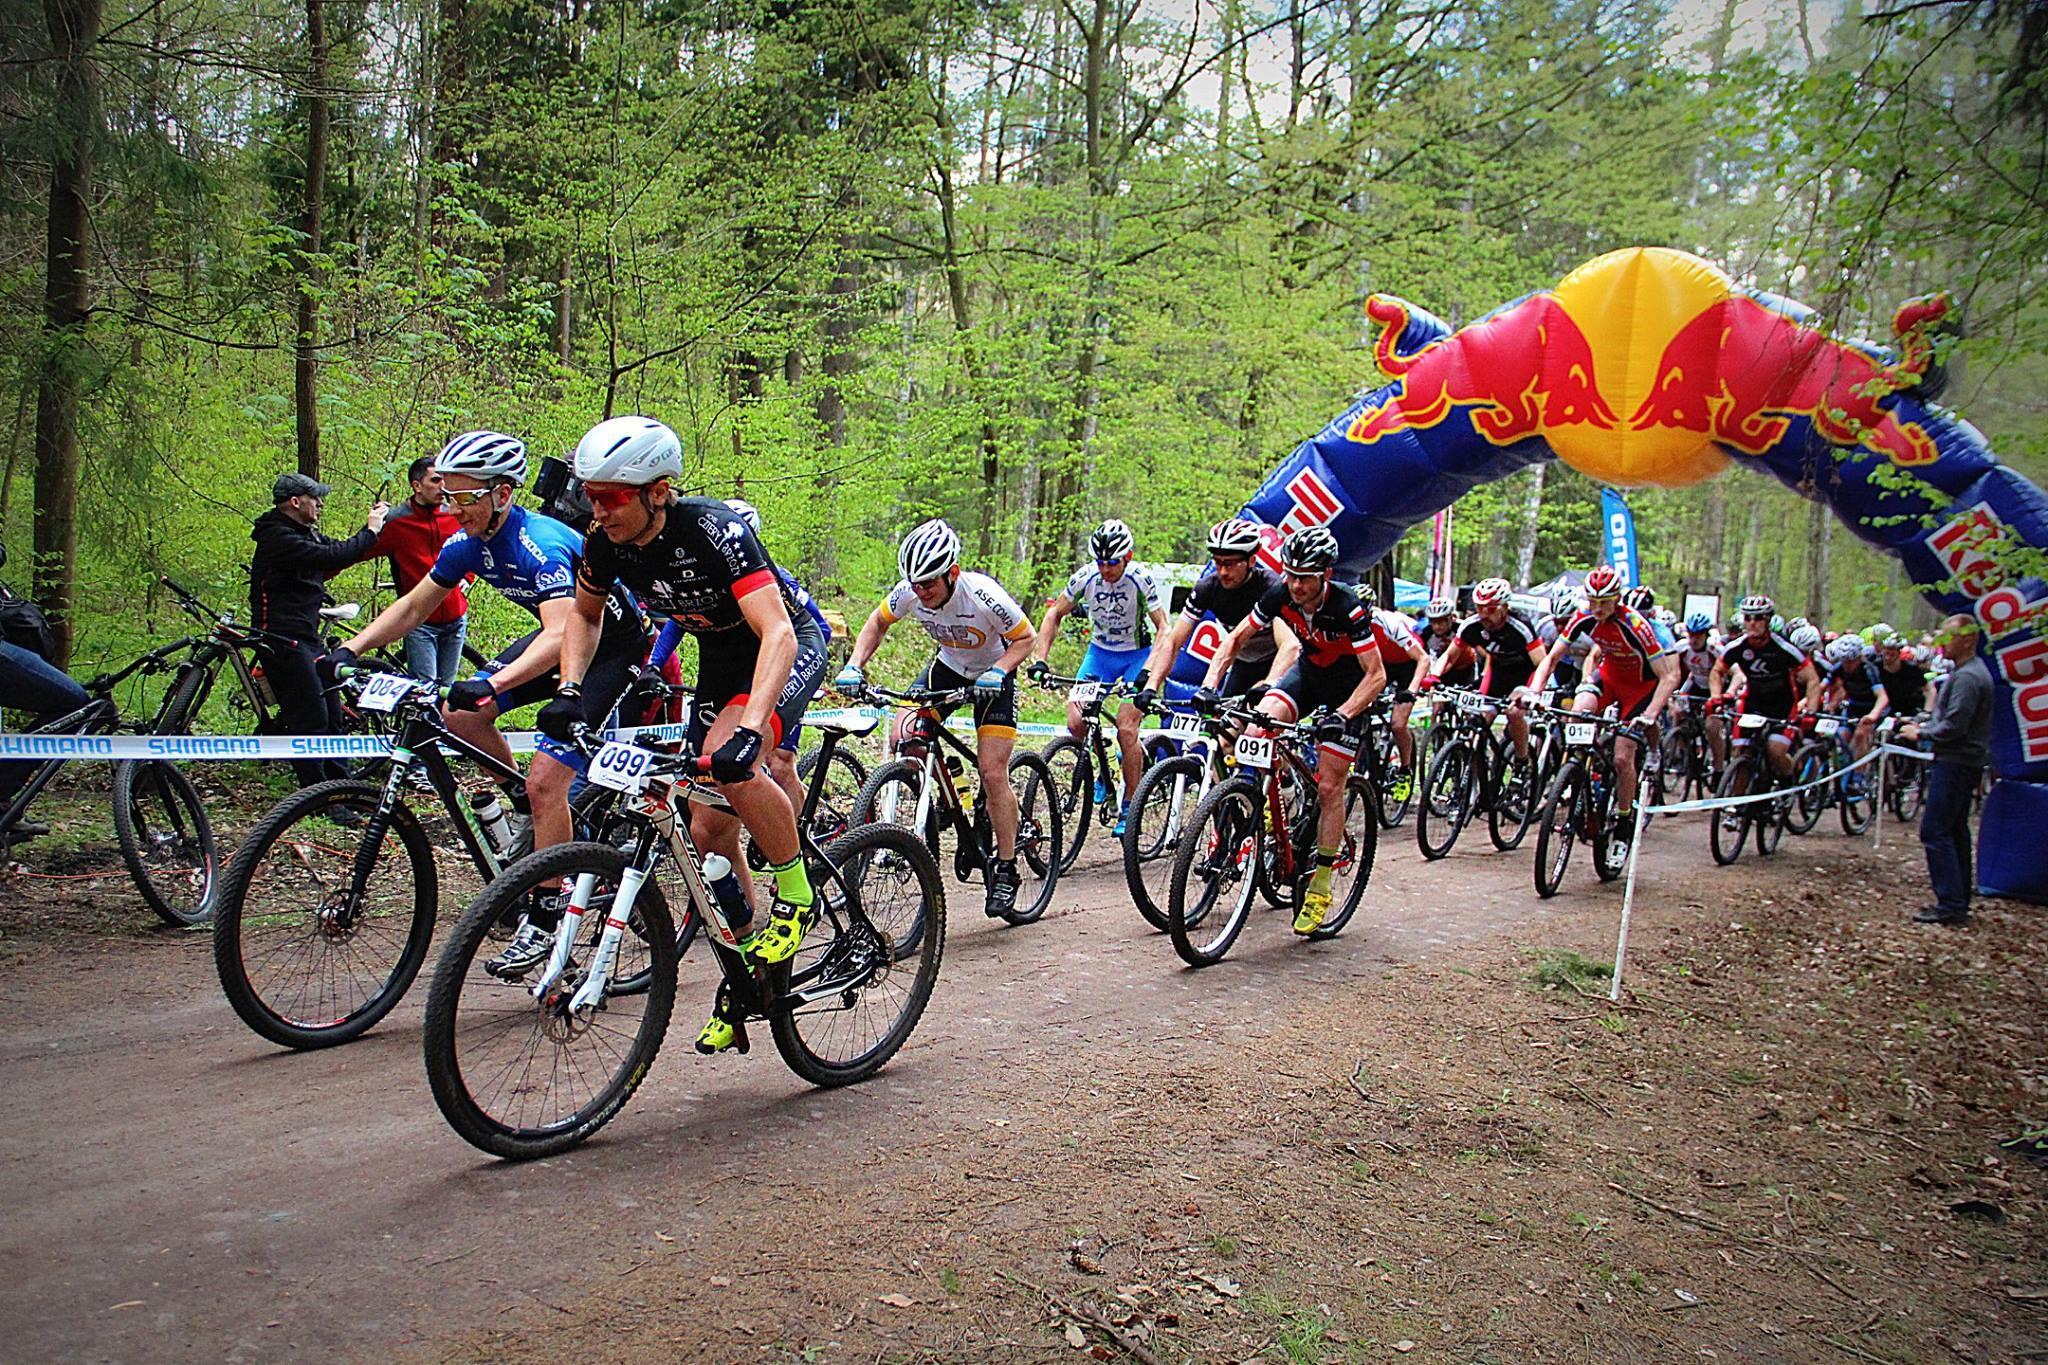 II Grand Prix Olsztyna [PR]